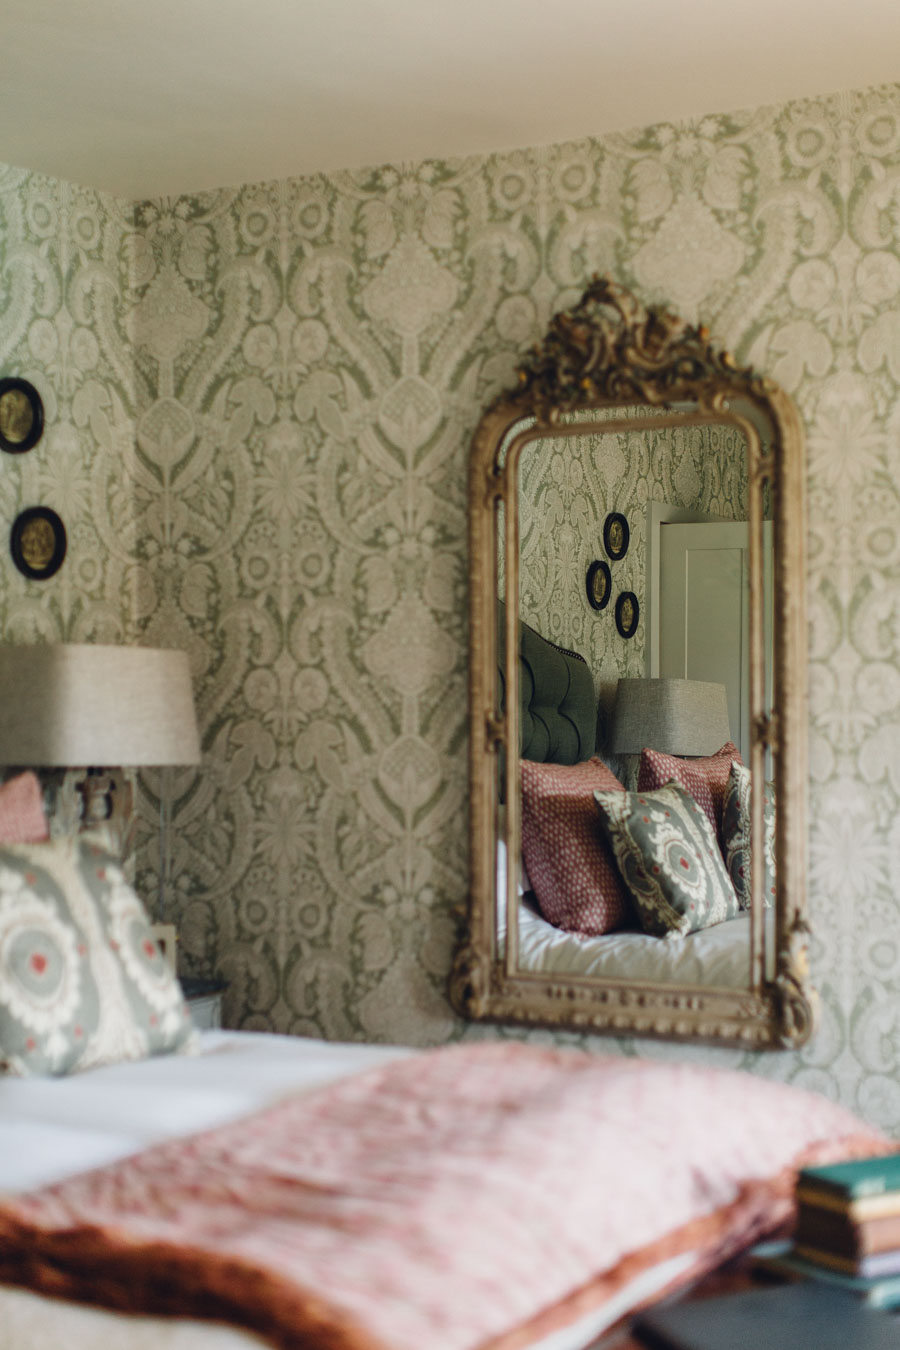 Romantic getaway Battel Hall